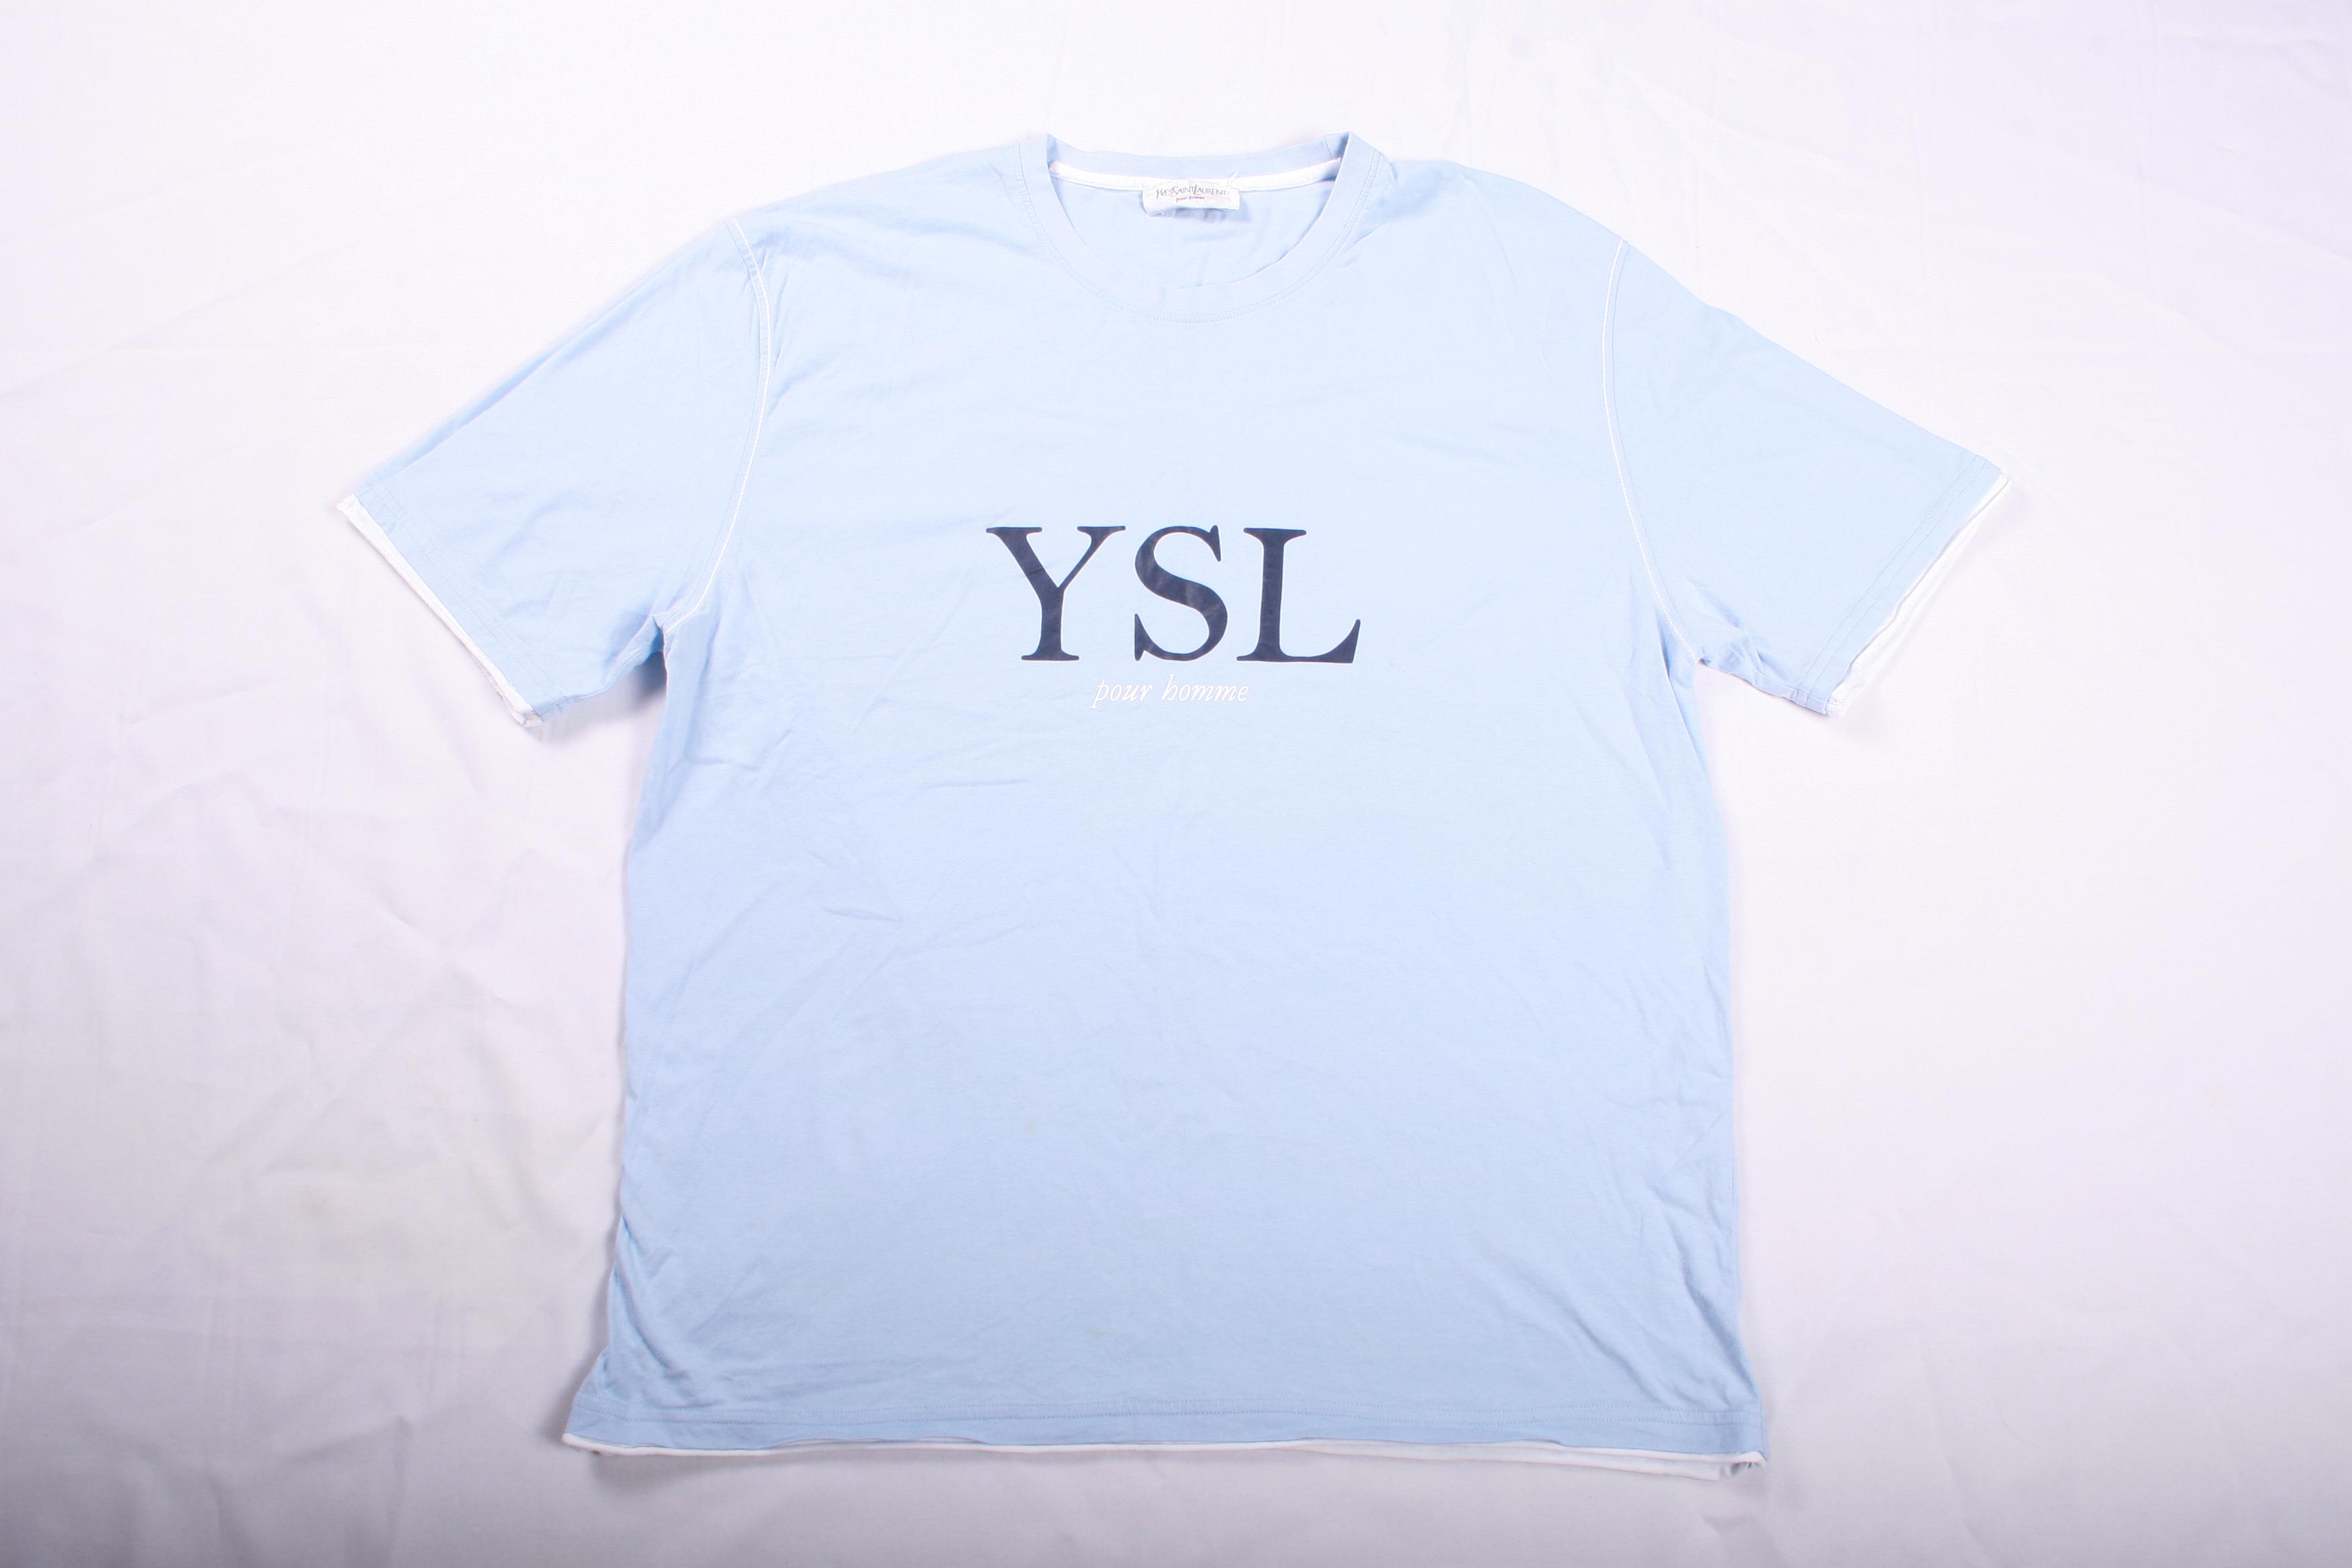 7bca84a8 Where Can I Get Ysl T Shirt - DREAMWORKS